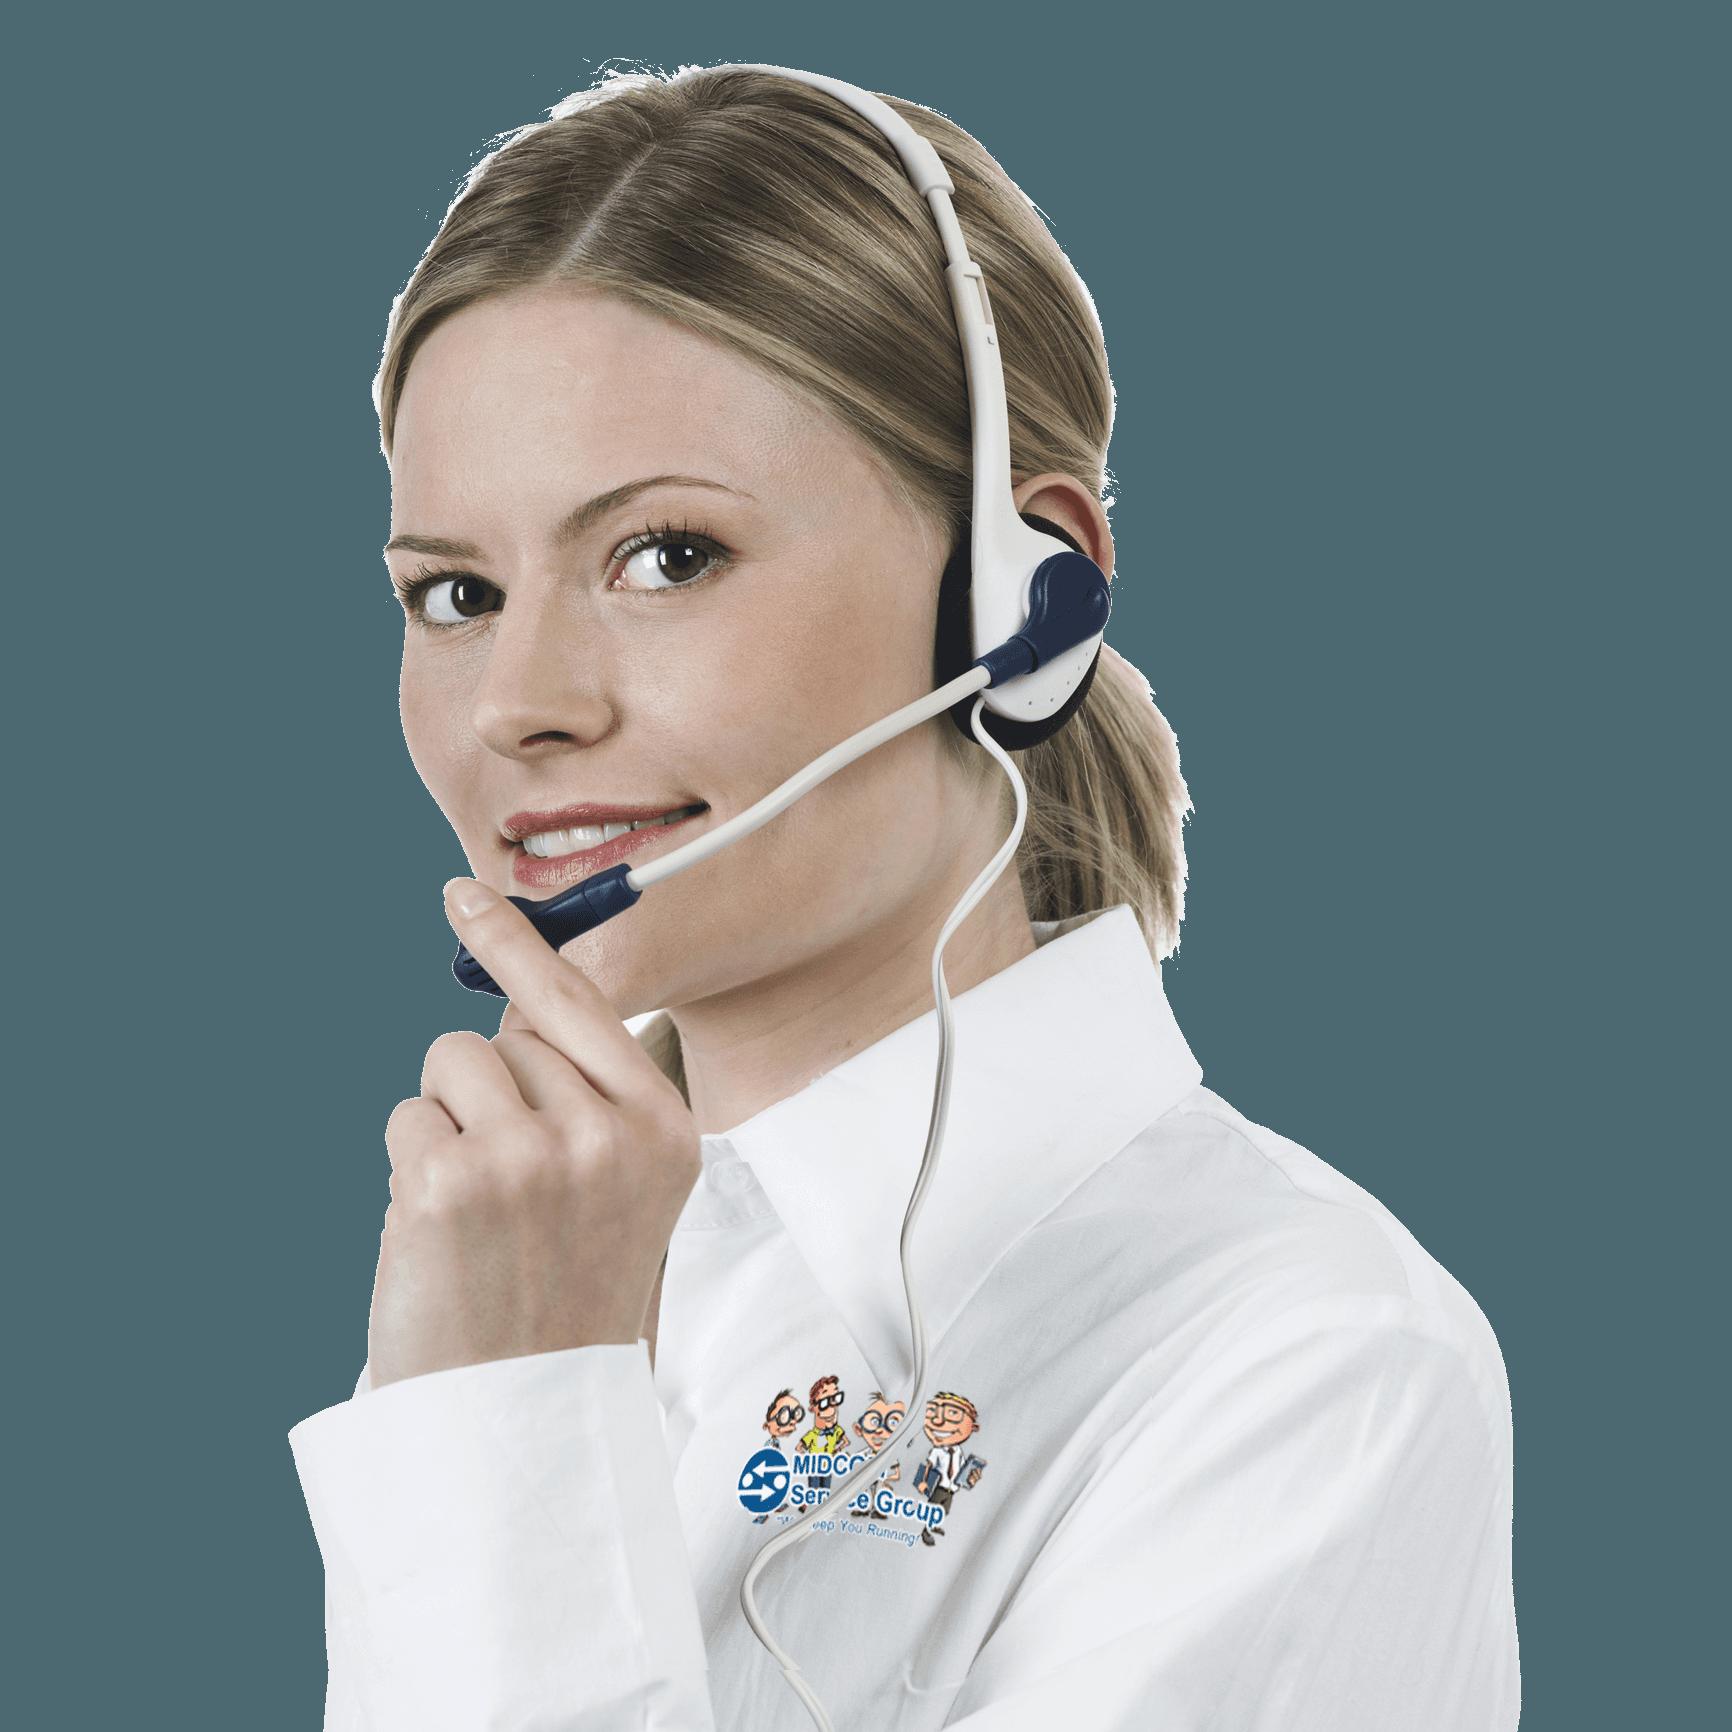 service coordinators